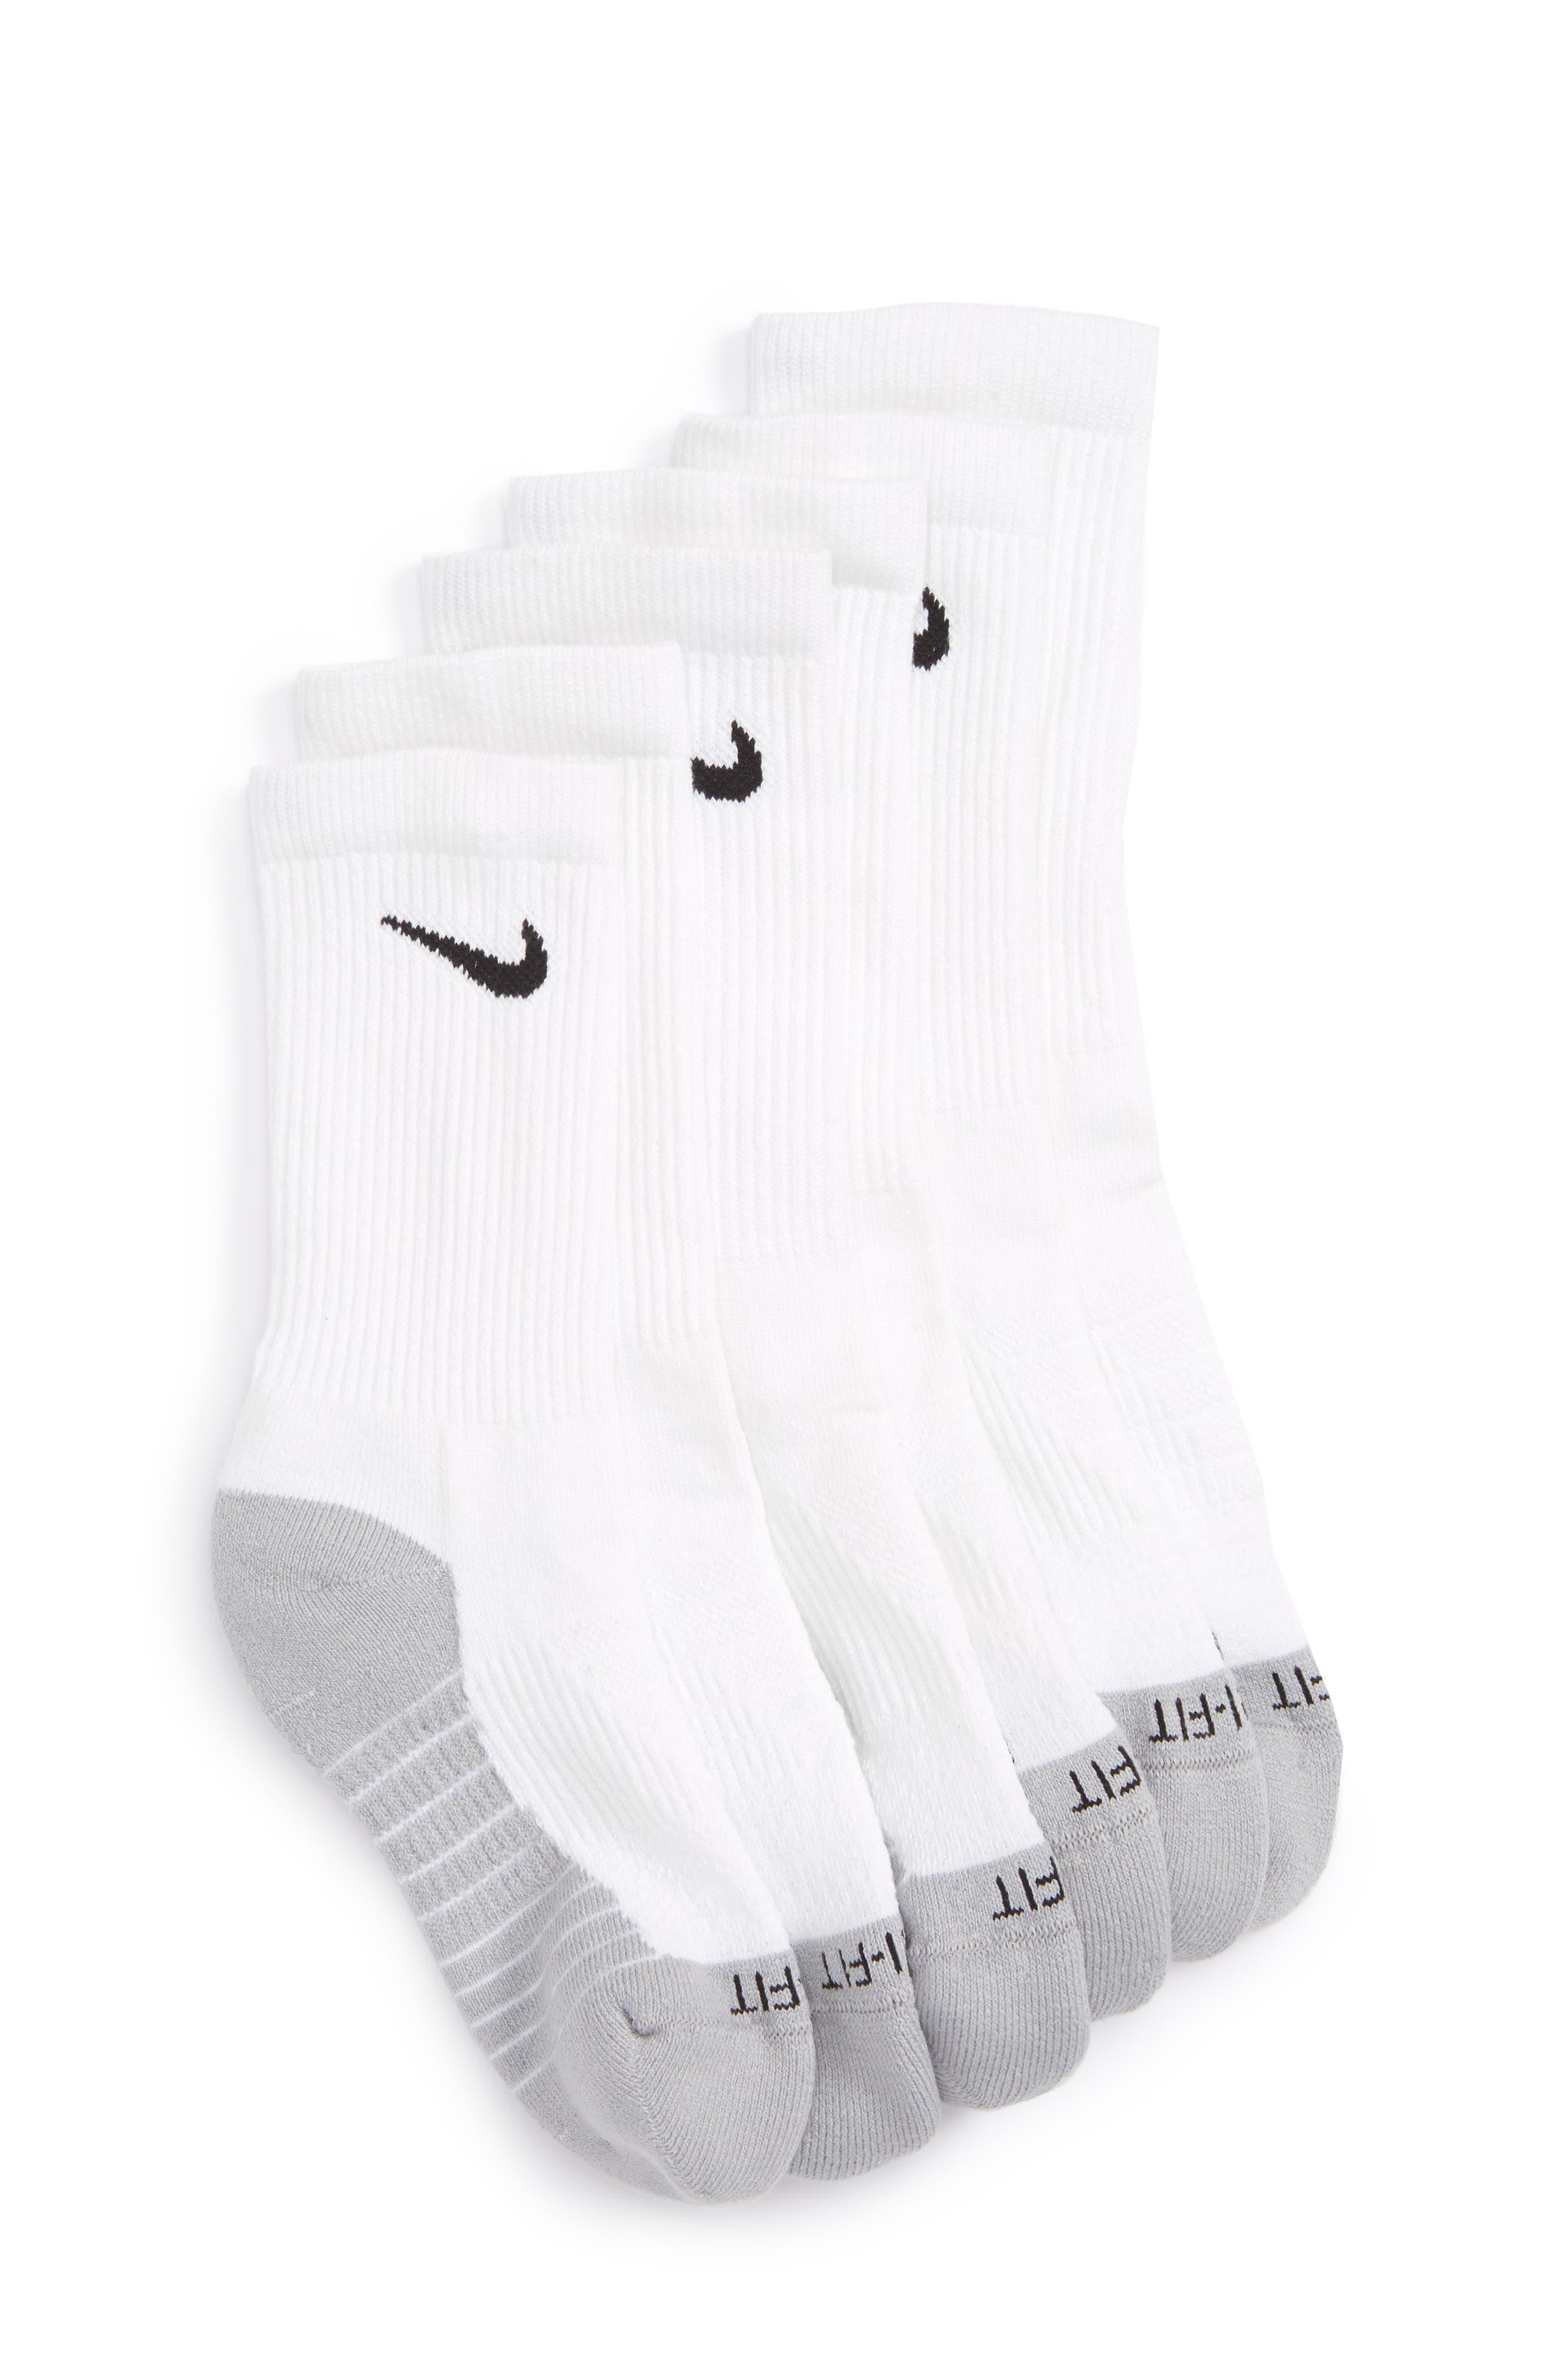 Nike Dry Ultimate Flight 3-Pack Cushioned Crew Socks (Kids)